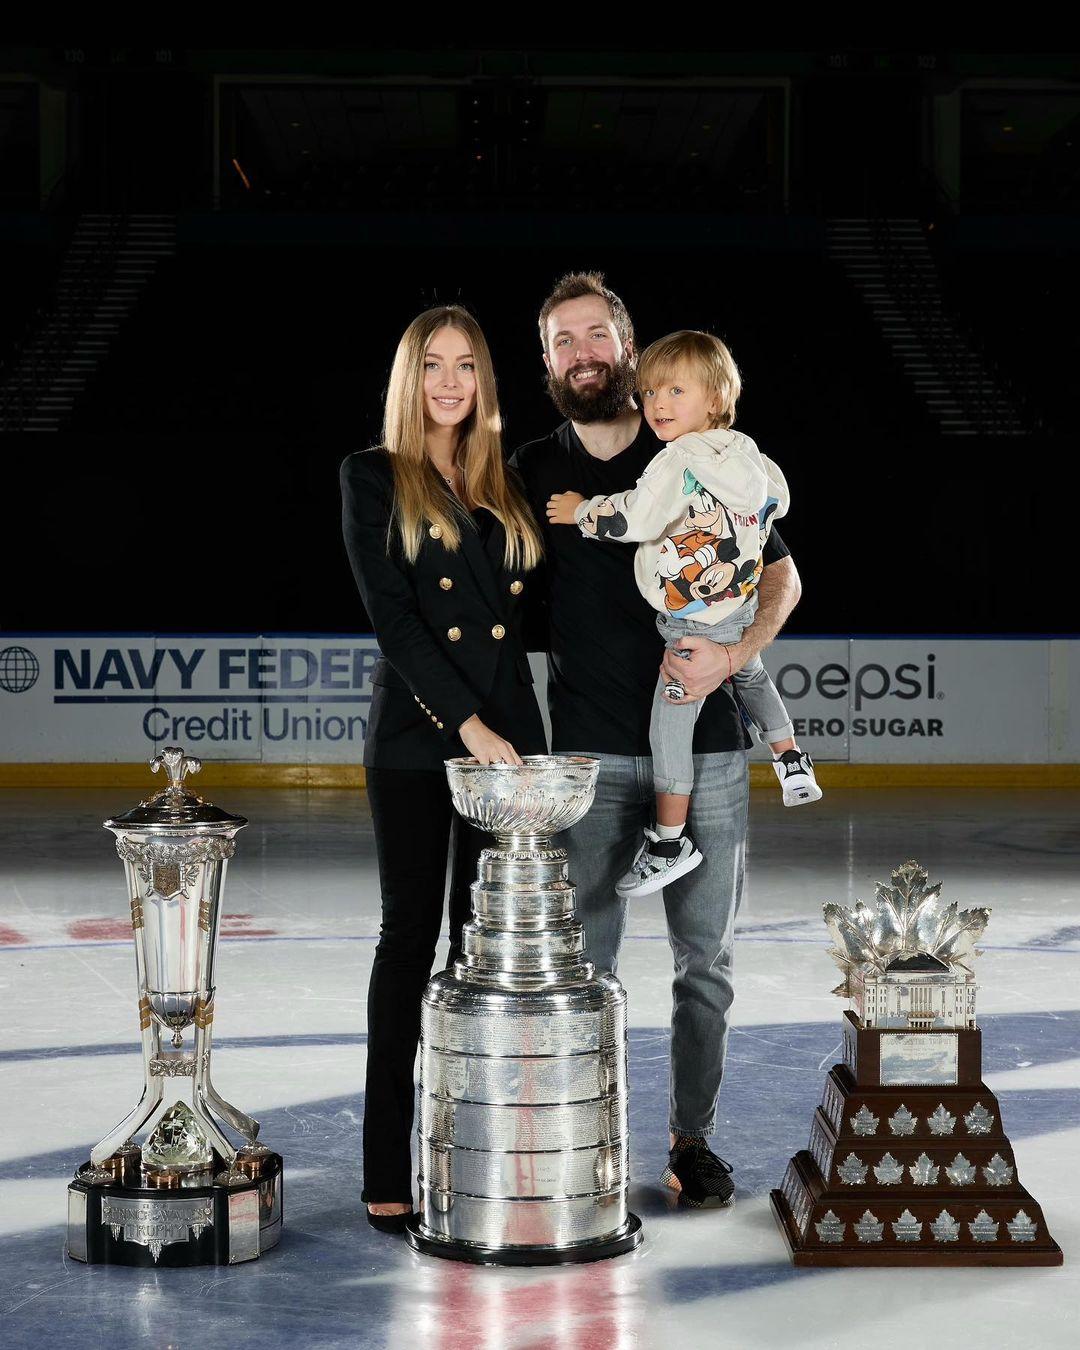 Nikita Kucherov, Anastasia Kucherova And Max Kucherov Photoshoot As A Family (Source: Instagram: nikitakucherov86)